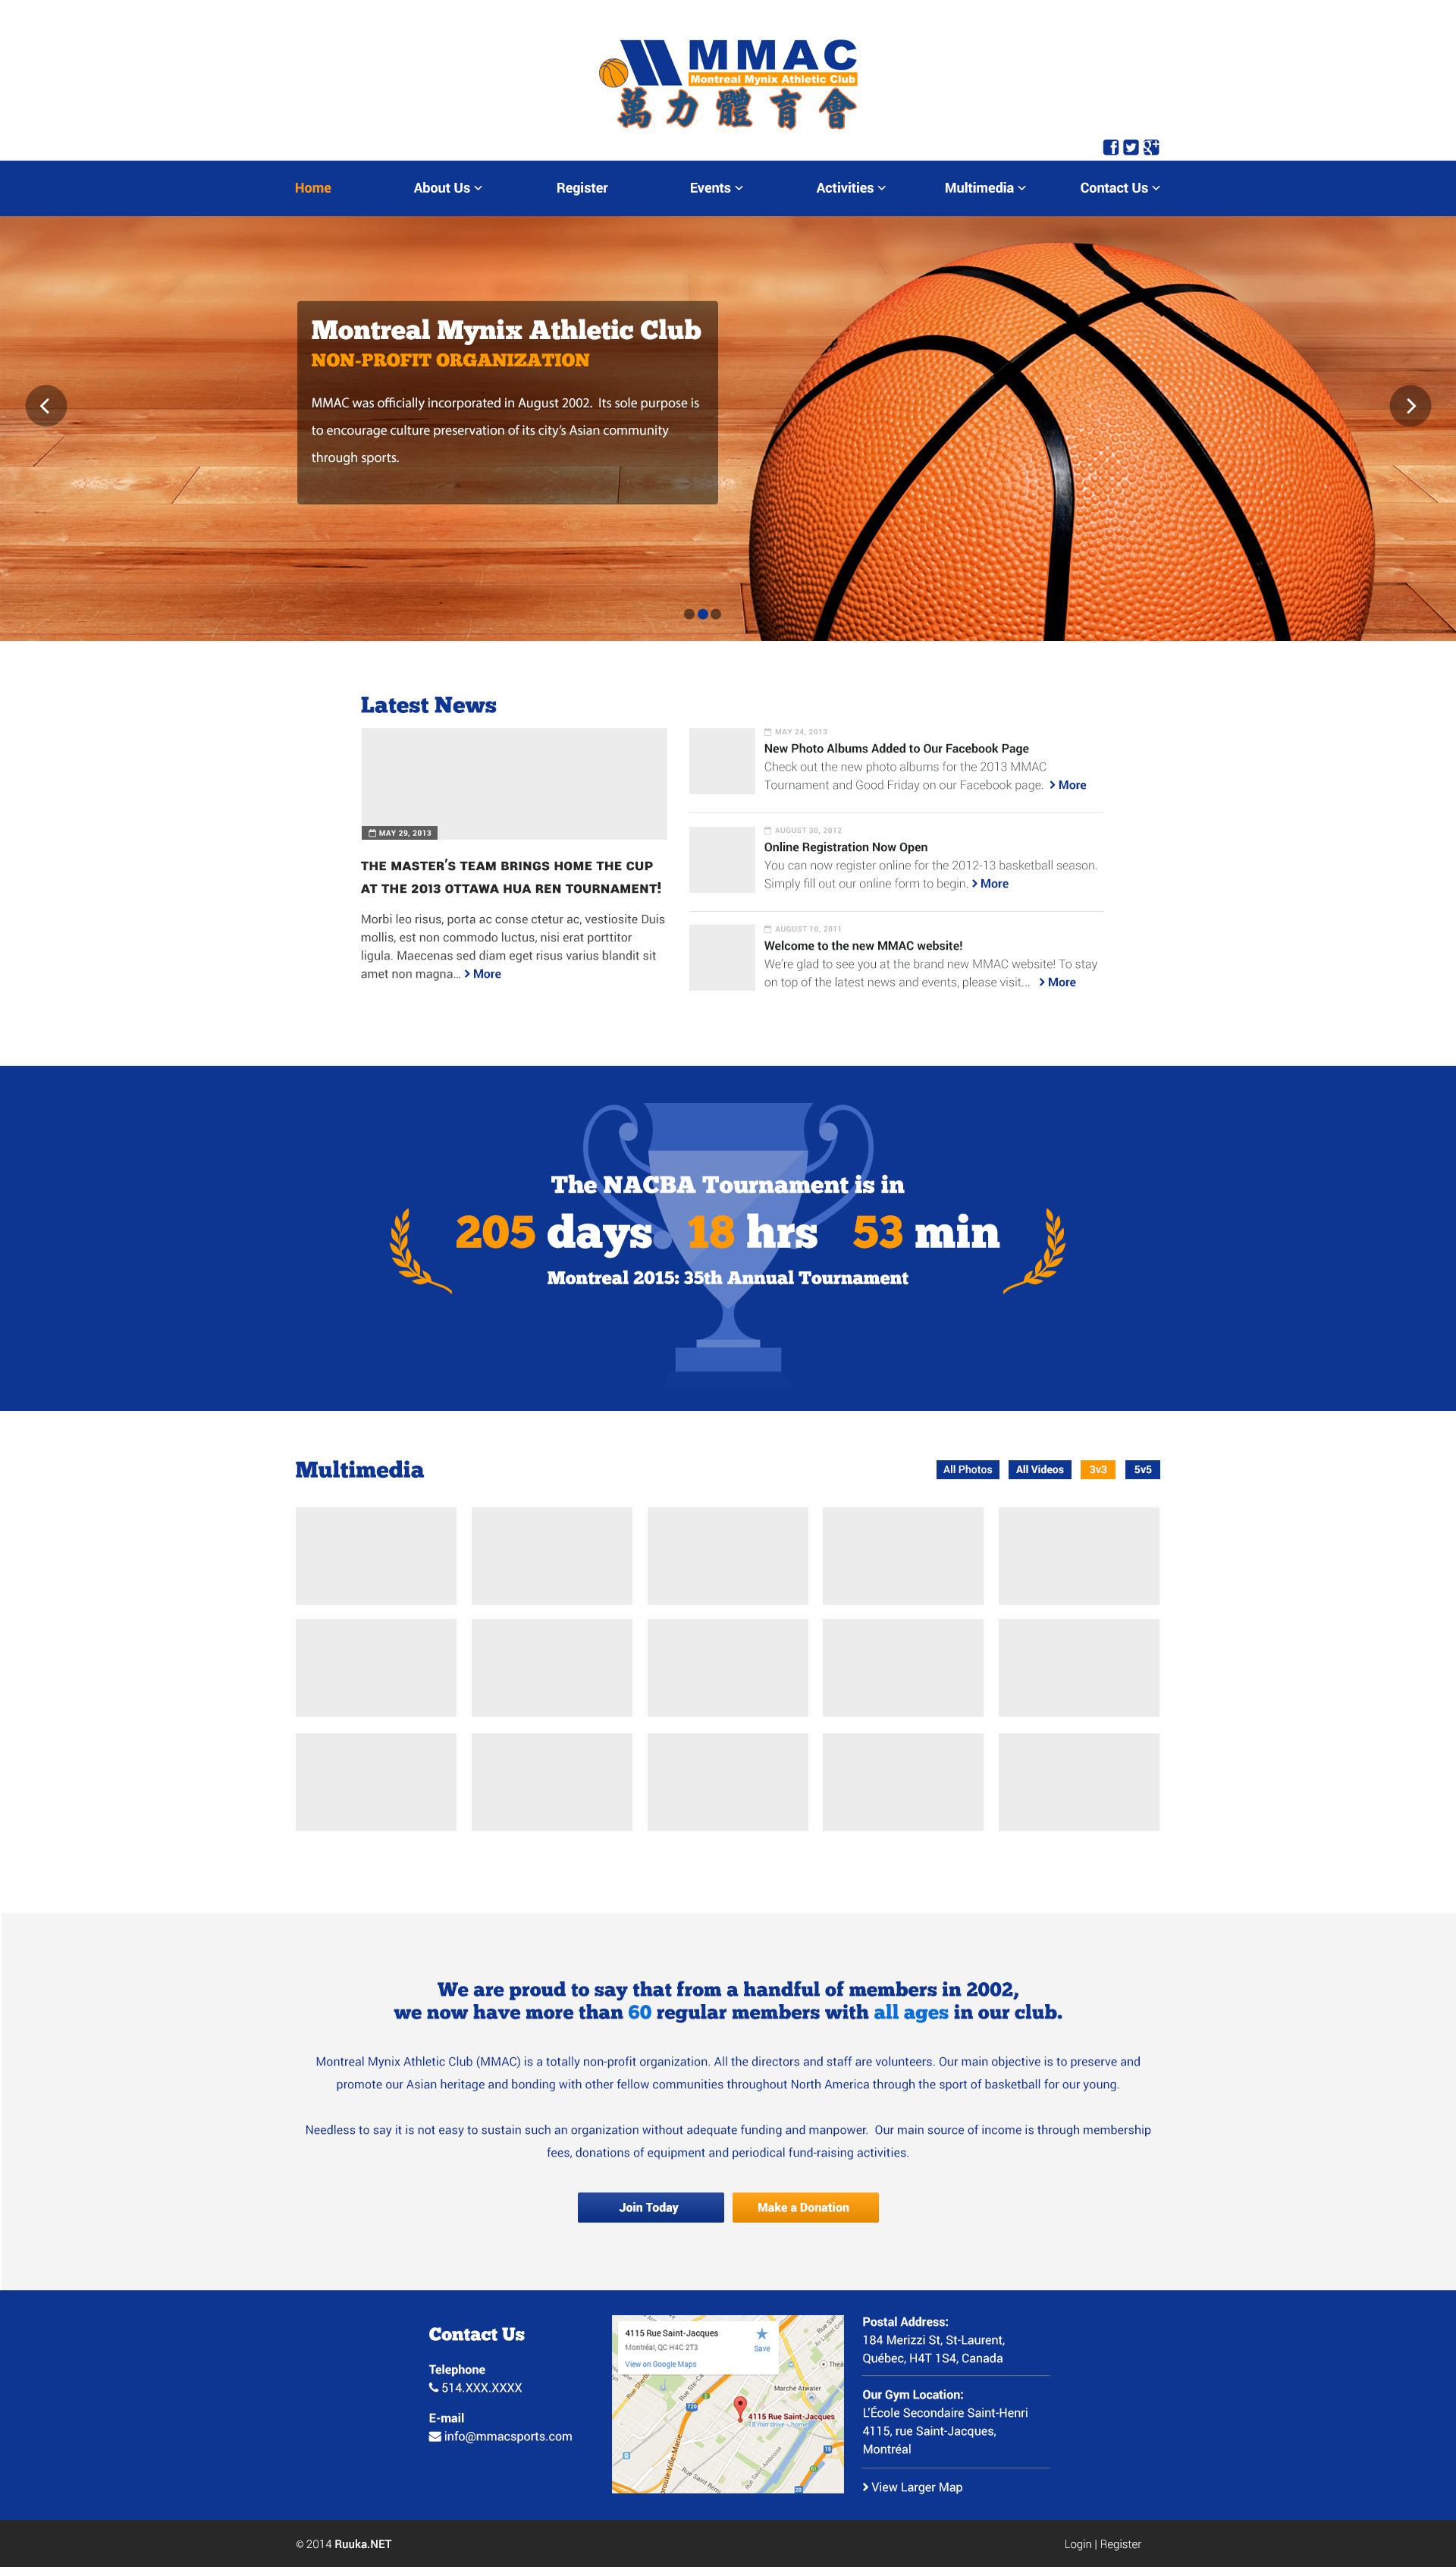 mmac-website